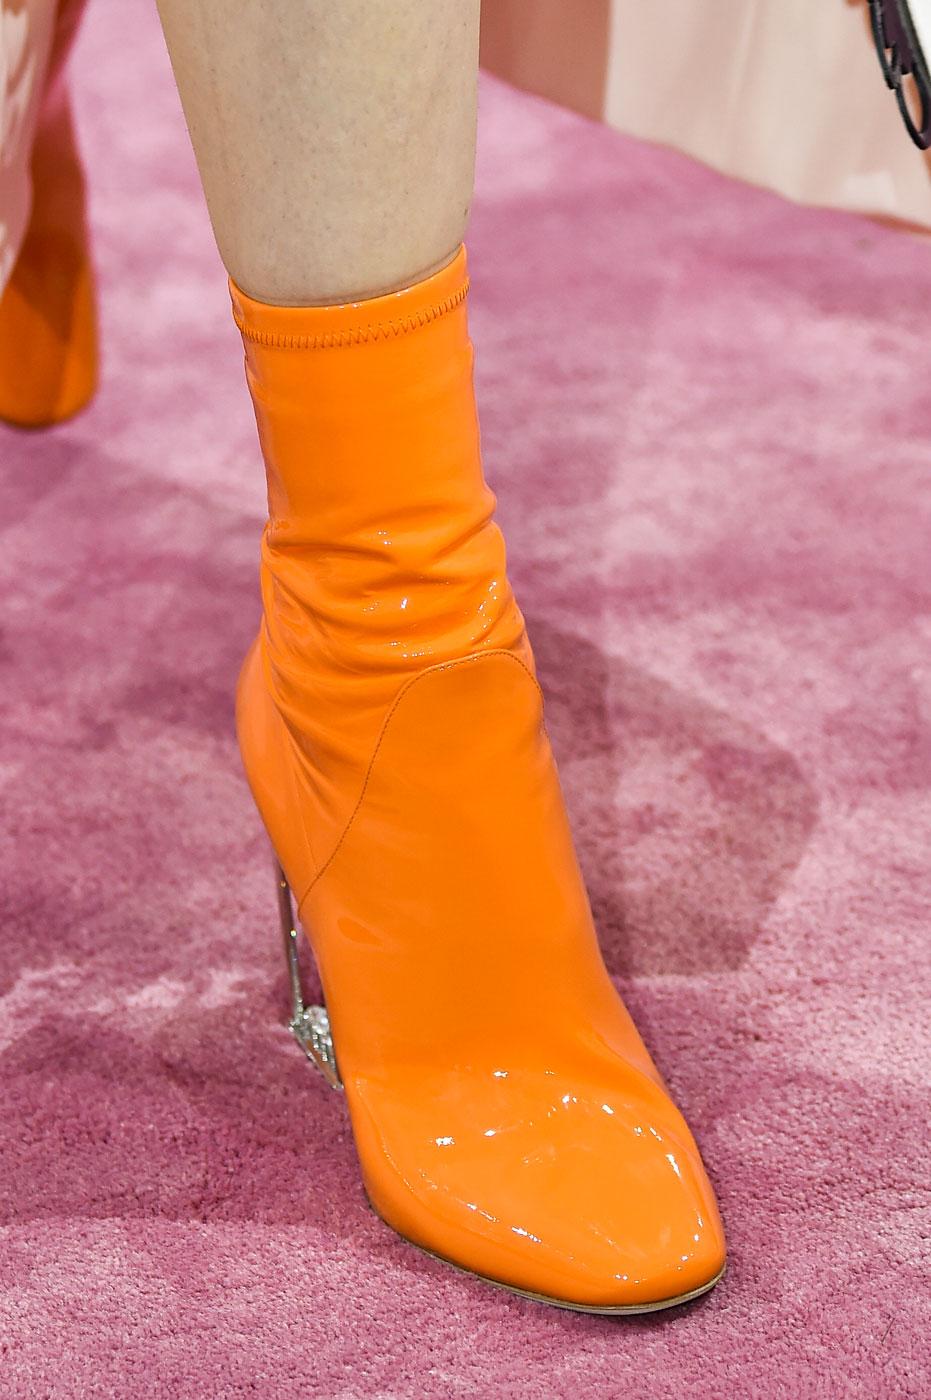 Christian-Dior-fashion-runway-show-close-ups-haute-couture-paris-spring-summer-2015-the-impression-120